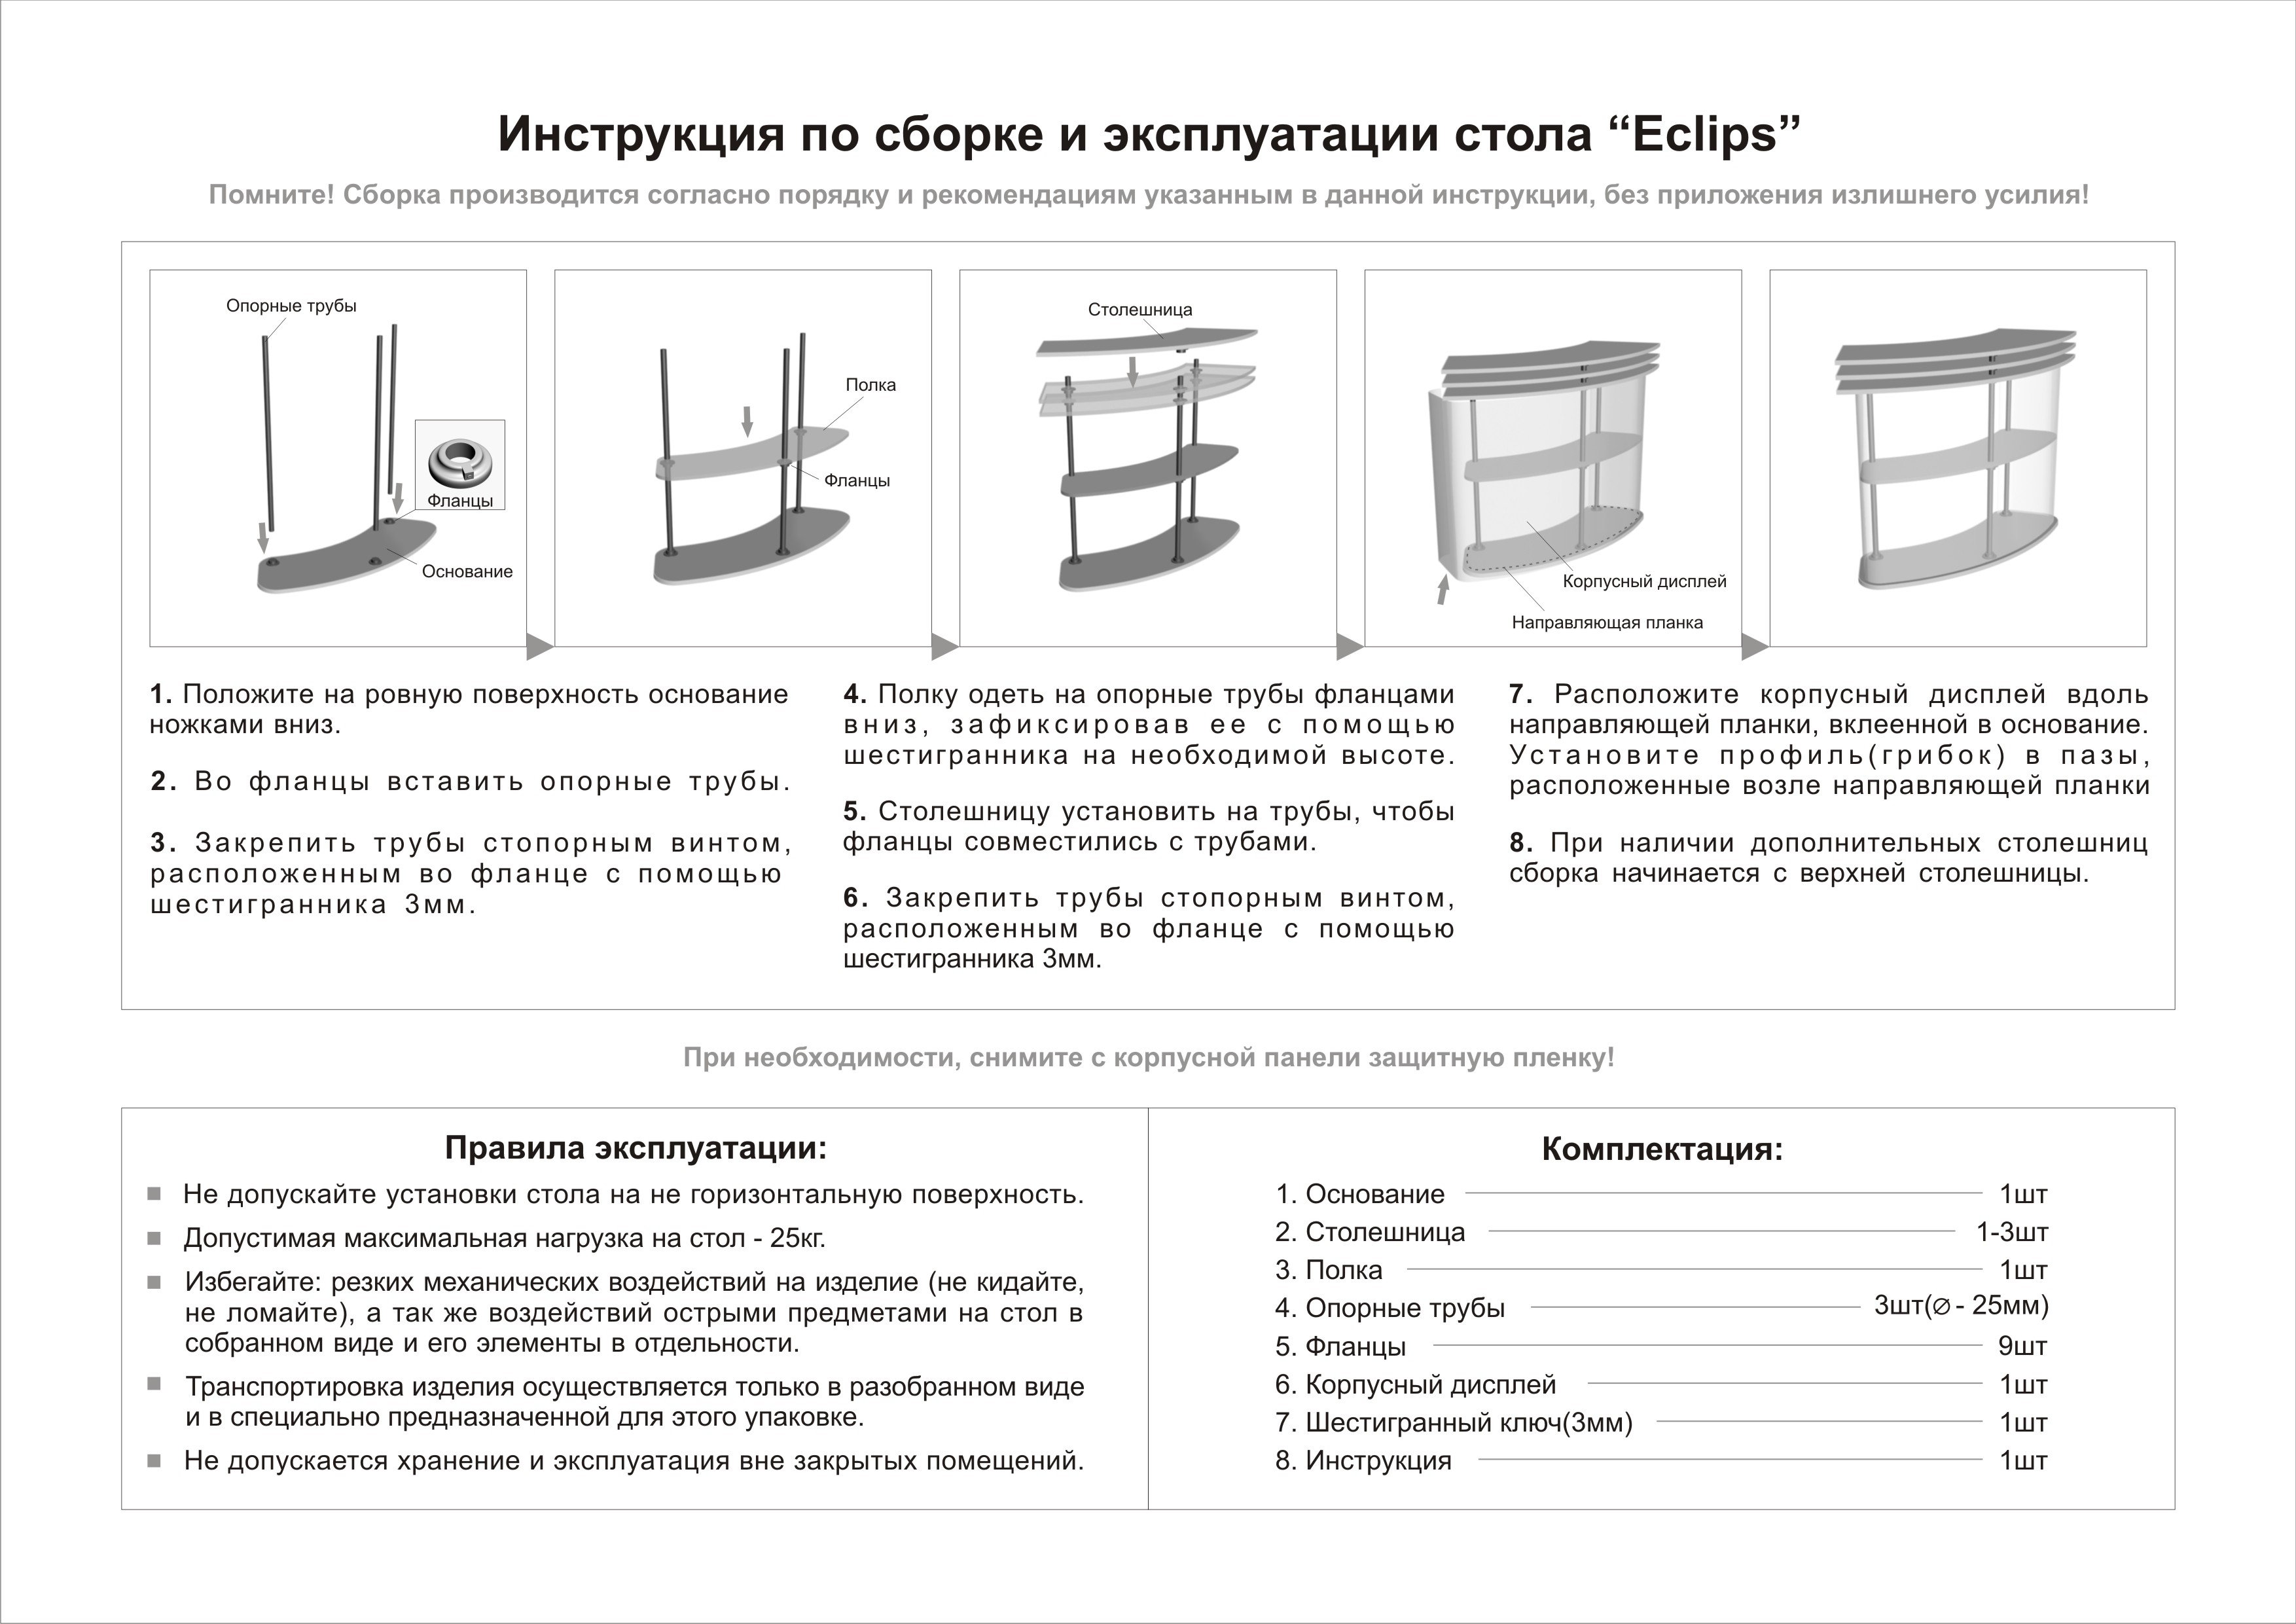 eclips2.jpg